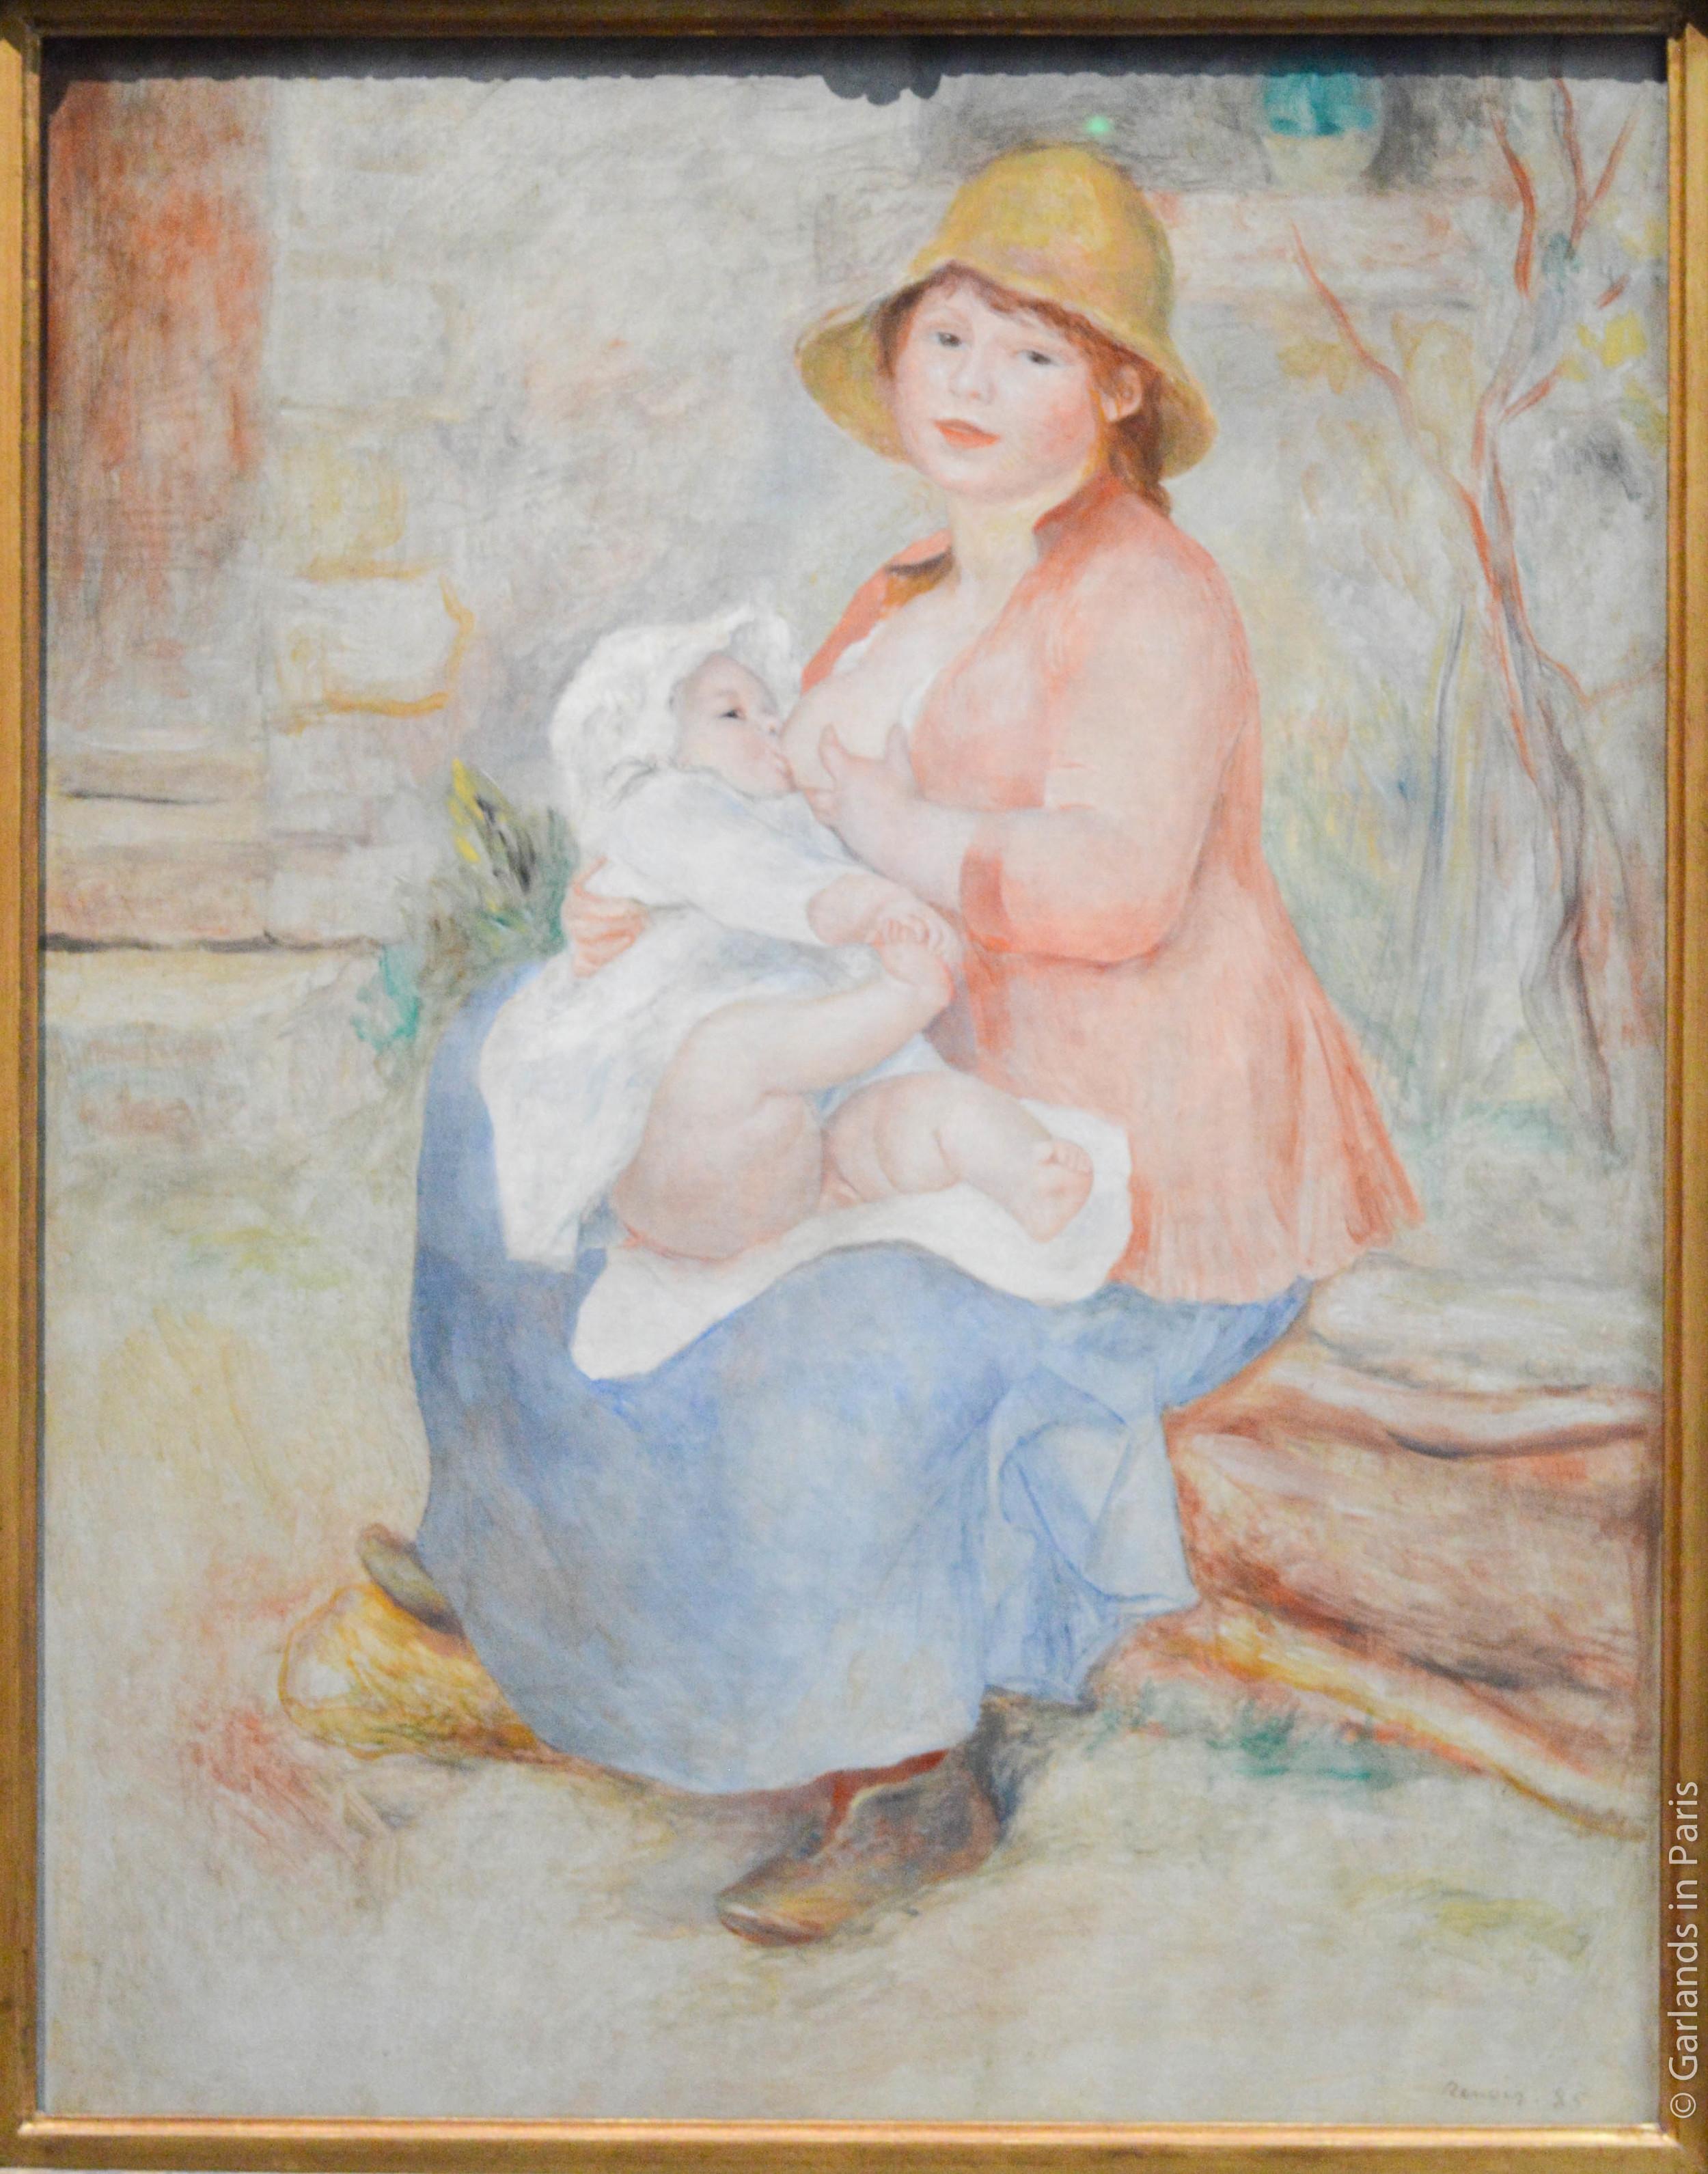 Mother breastfeeding, Musée d'Orsay